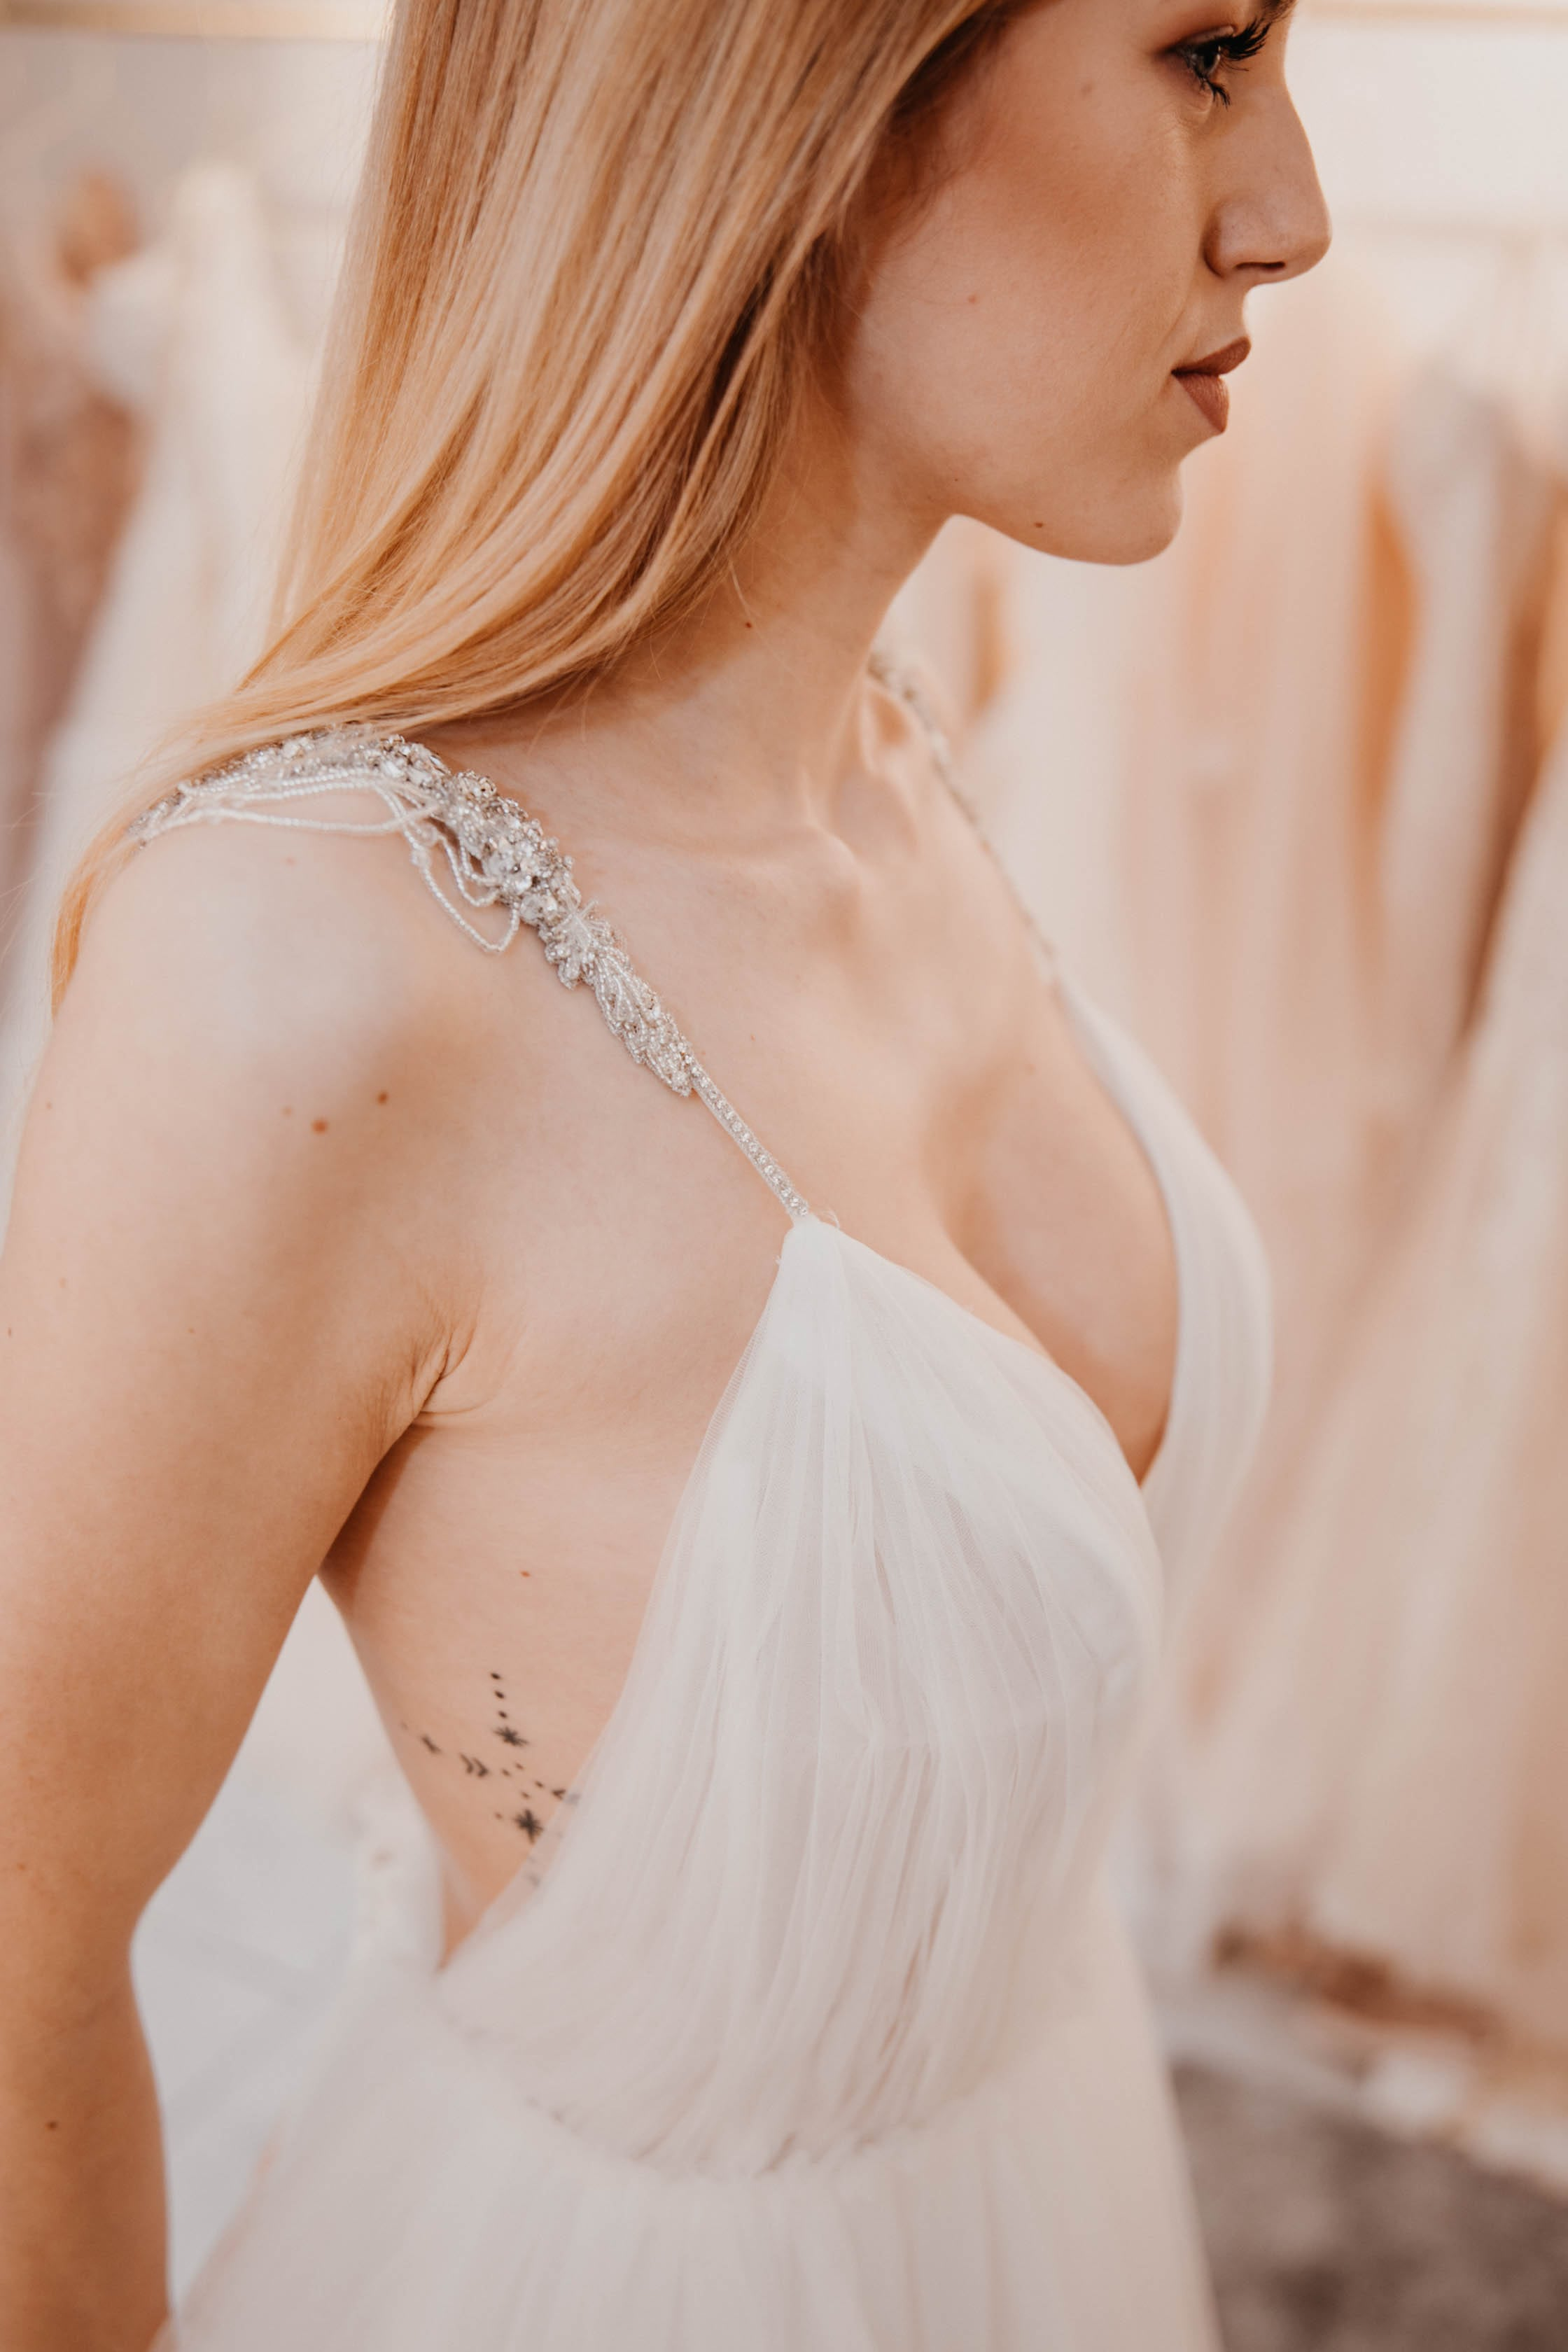 Jennifer Mastroianni Bridal beauty store 01 min